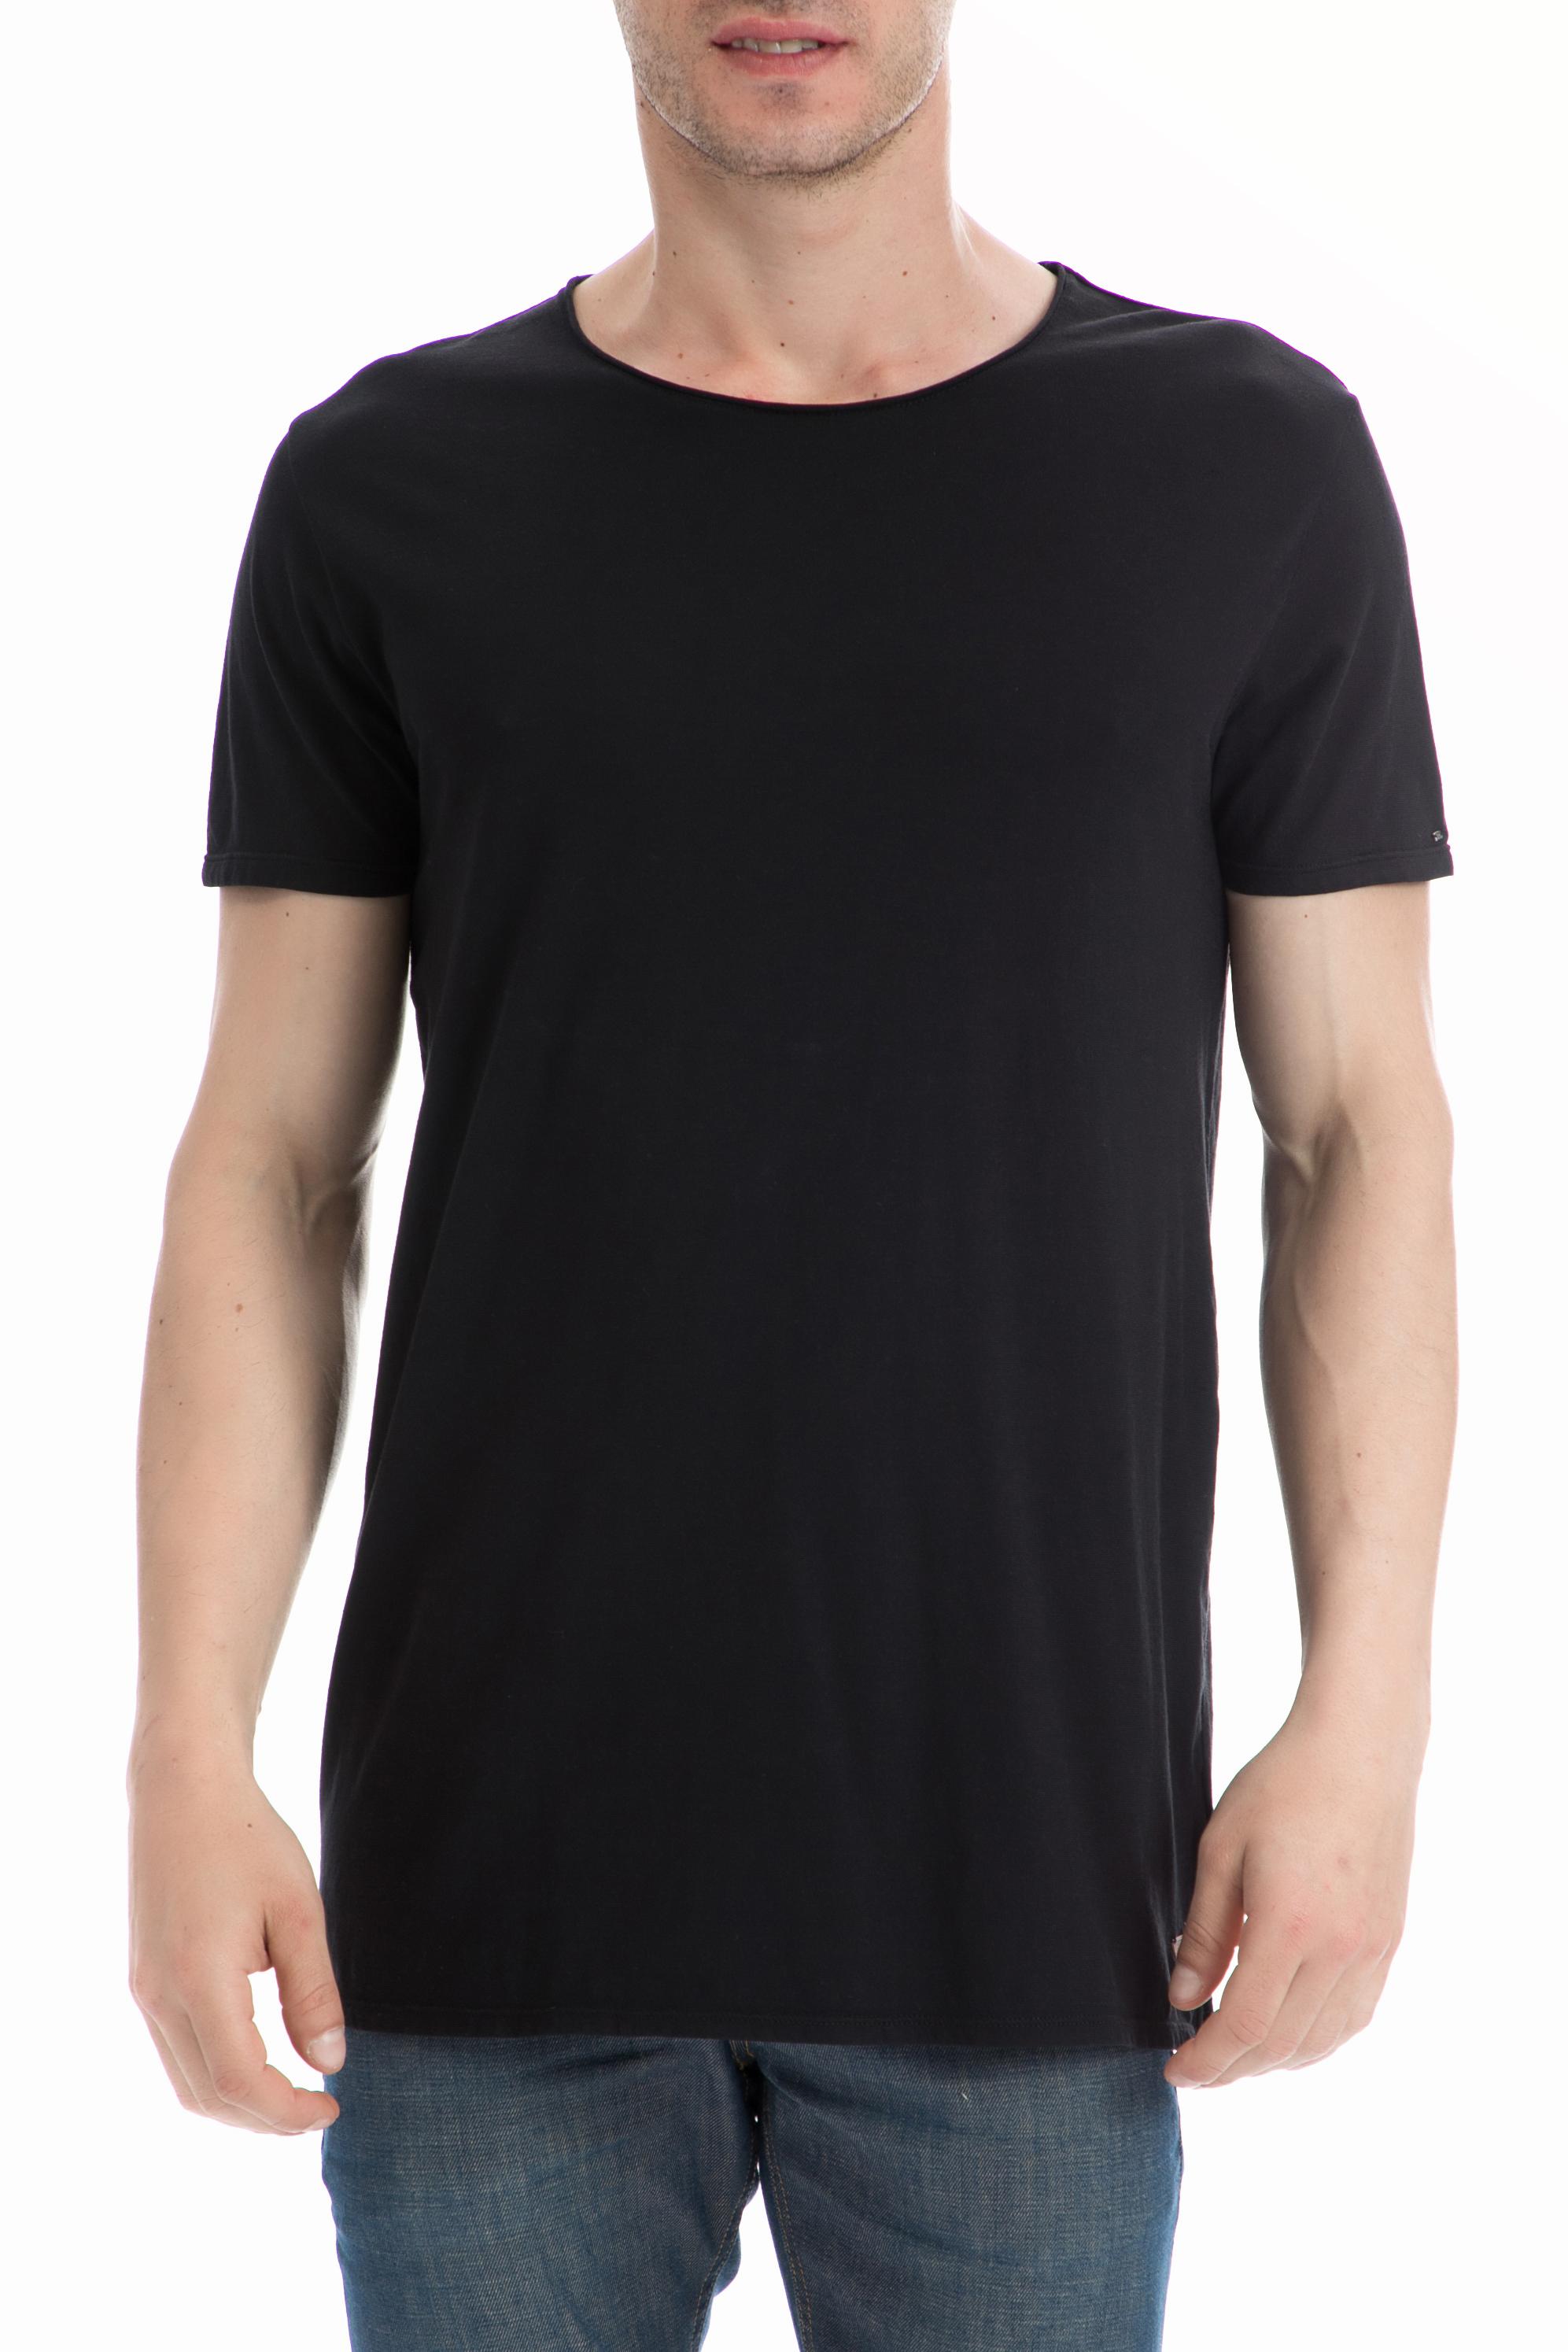 SCOTCH & SODA - Ανδρική μπλούζα SCOTCH & SODA μαύρη ανδρικά ρούχα μπλούζες κοντομάνικες